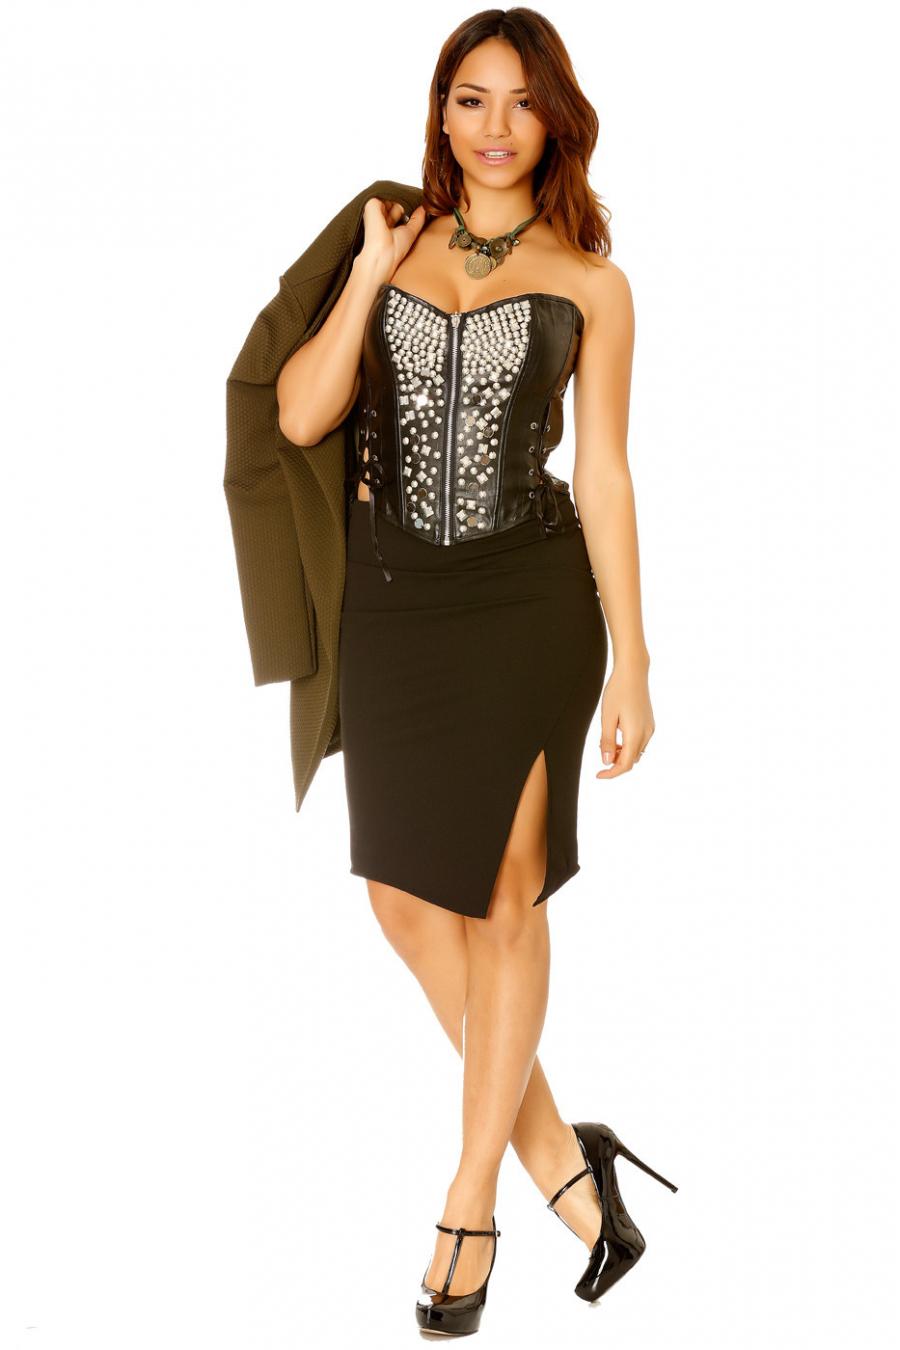 Zwarte faux bustier met rits, strass steentjes en kant. Mode en sexy bustier voor vrouwen